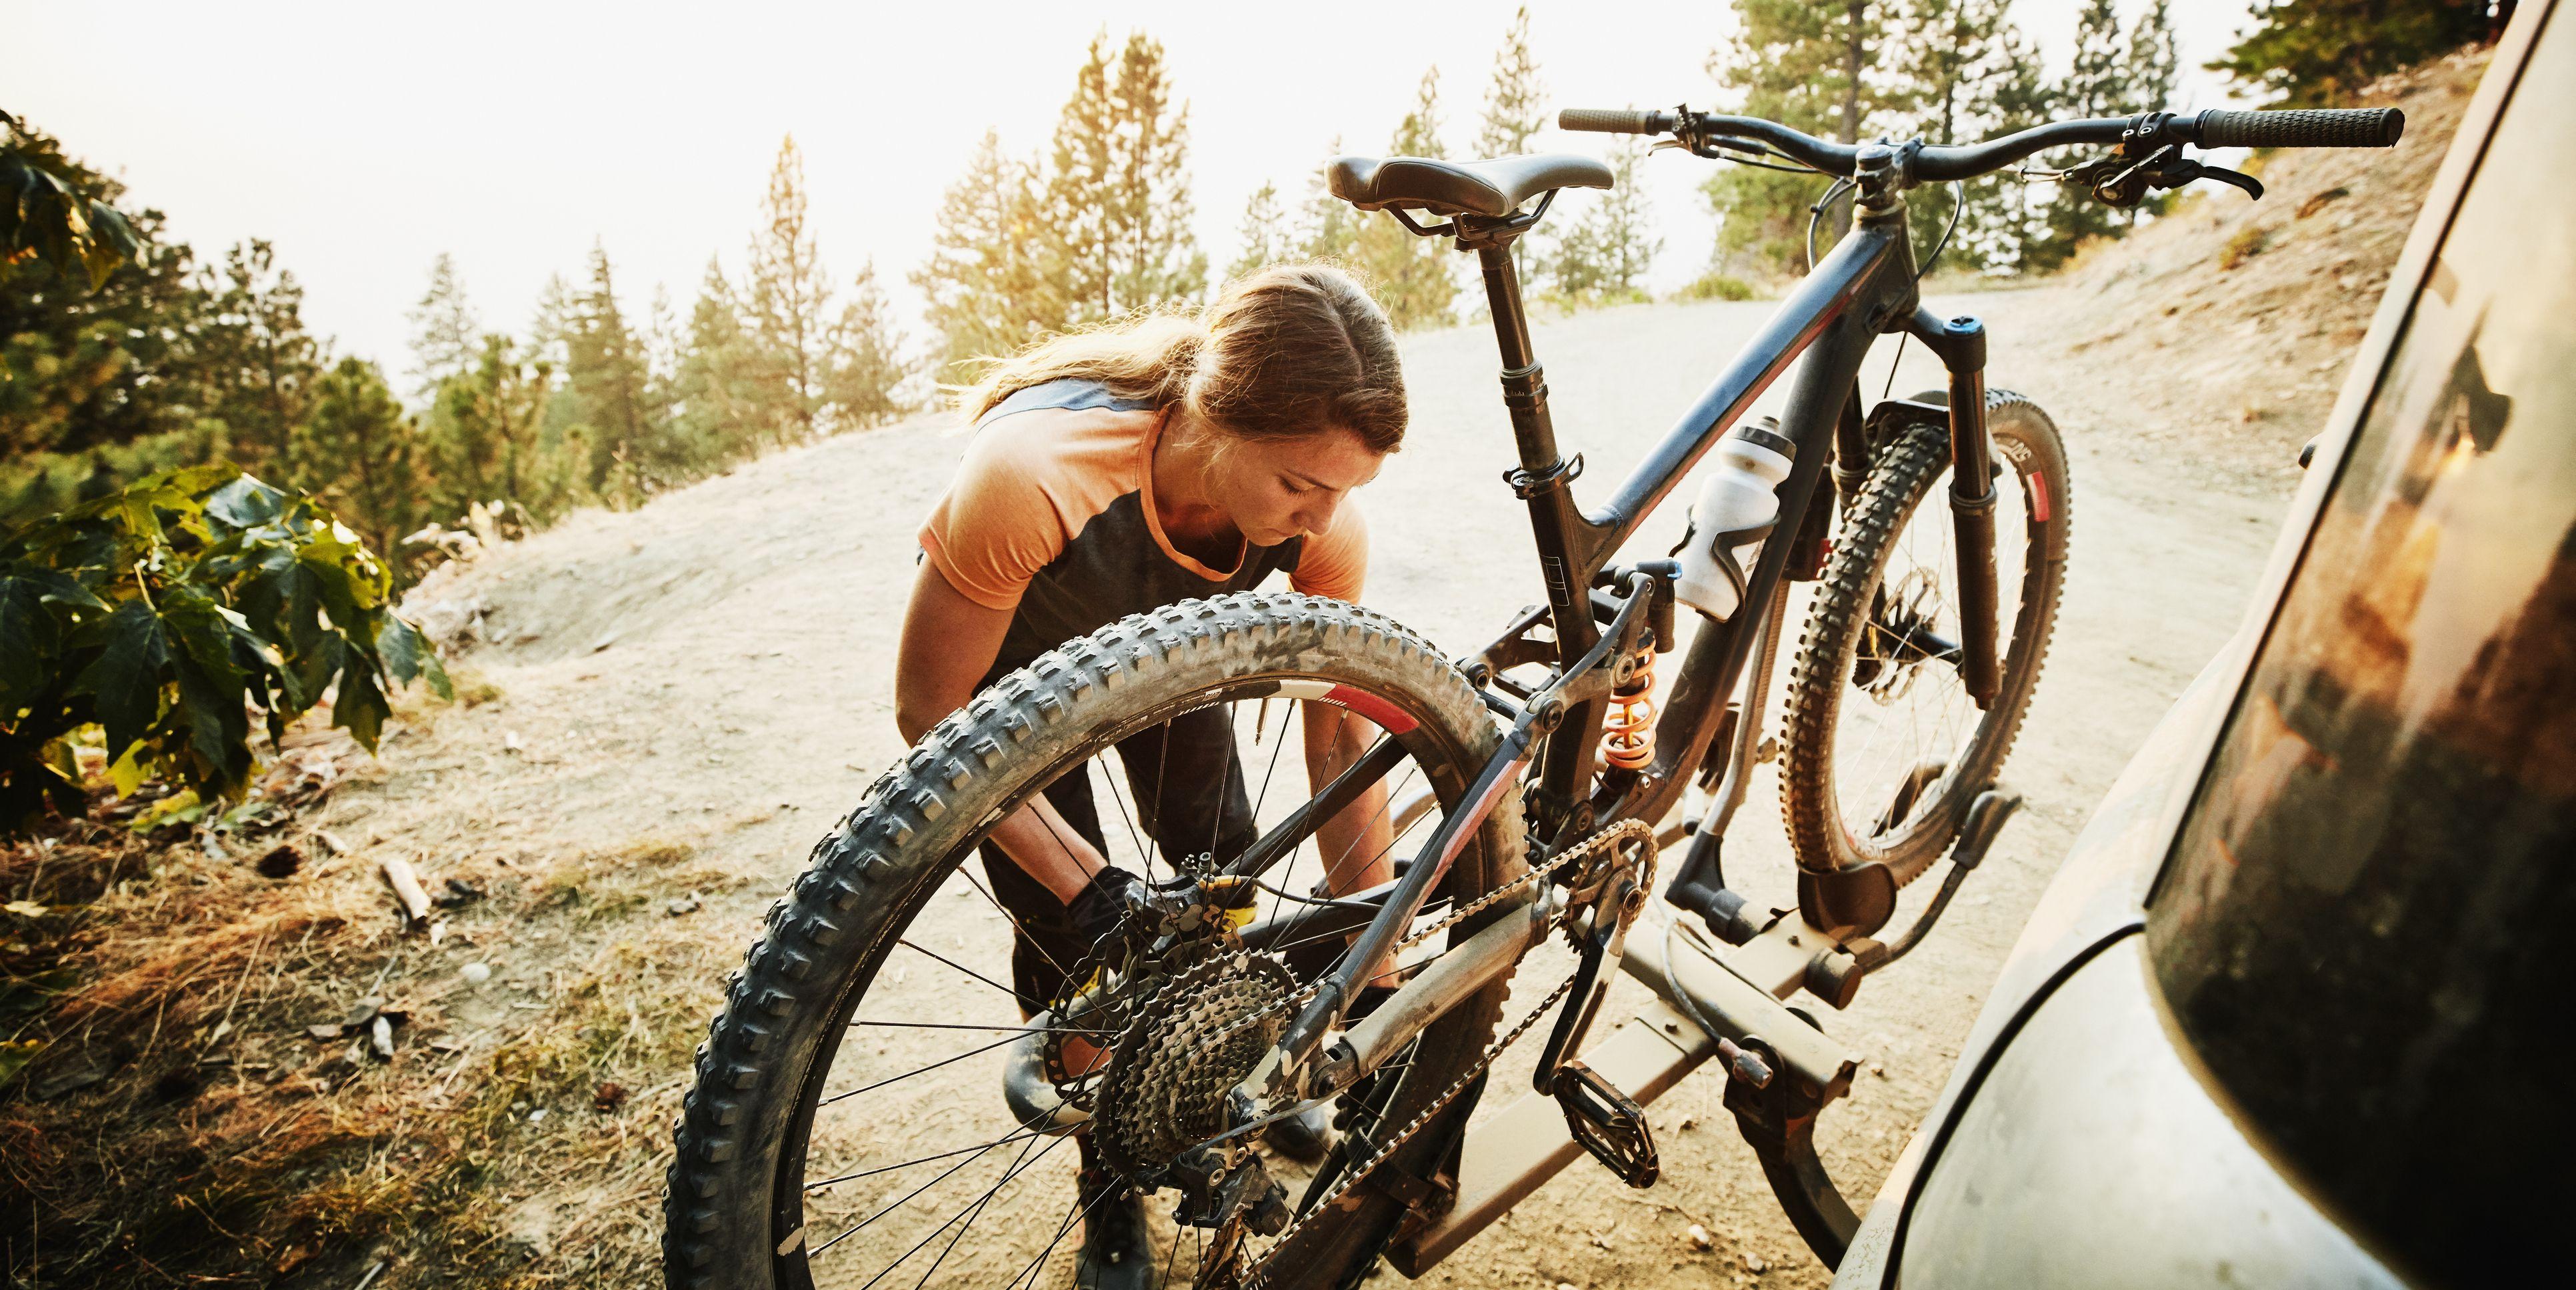 Female mountain biker putting bike on car after ride on summer evening